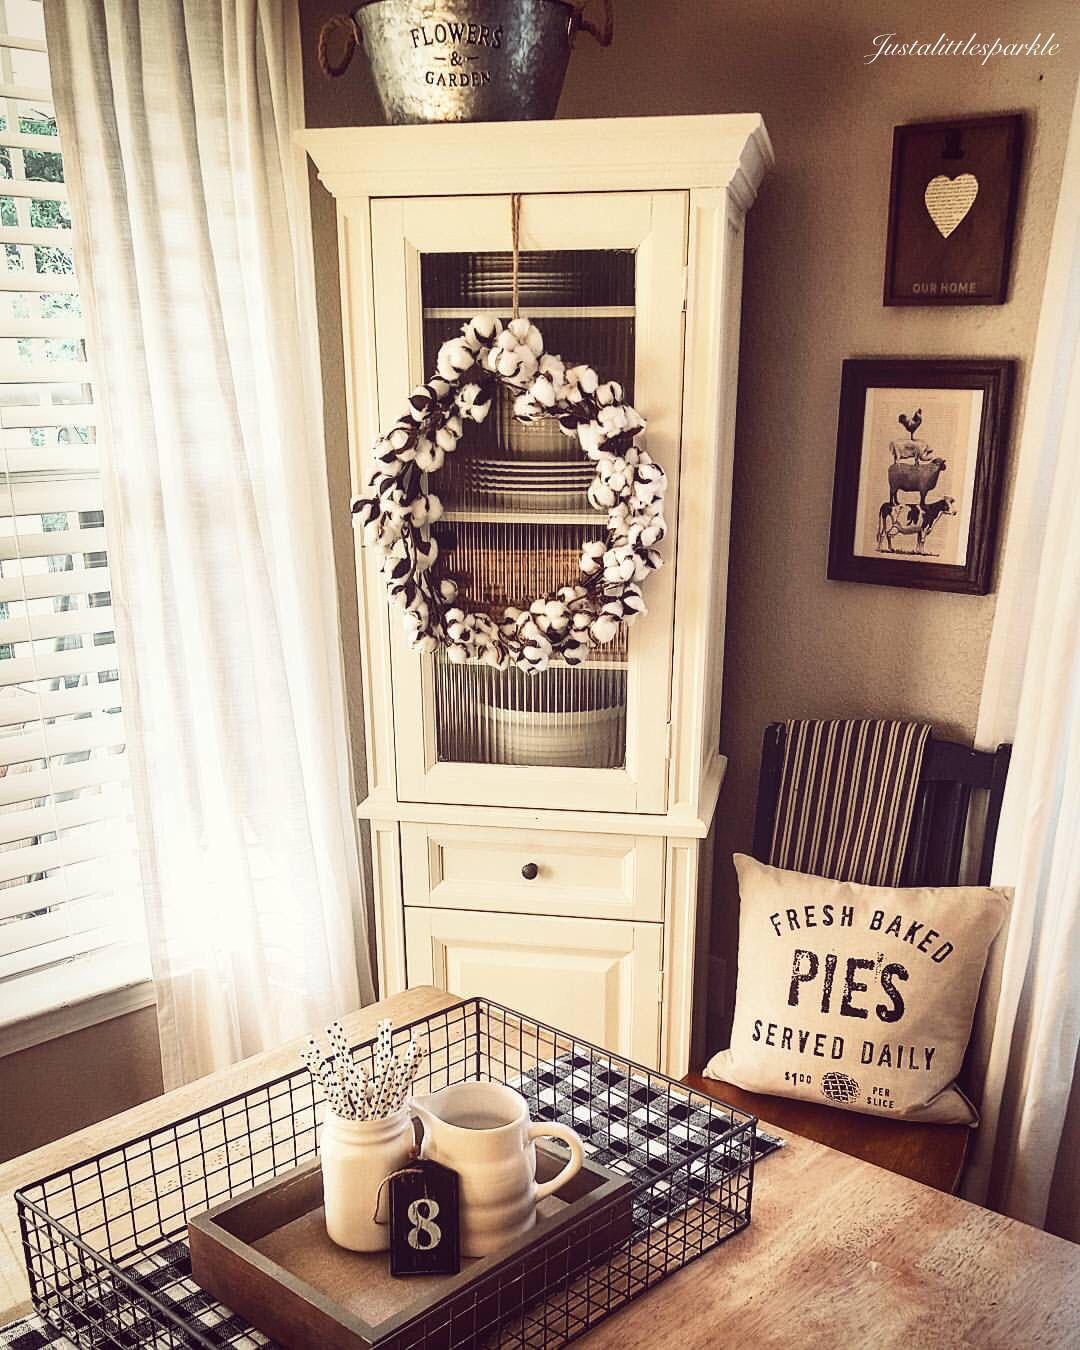 Badezimmer dekor bei kohls cotton wreath farmhouse dining room rustic style rustic dining